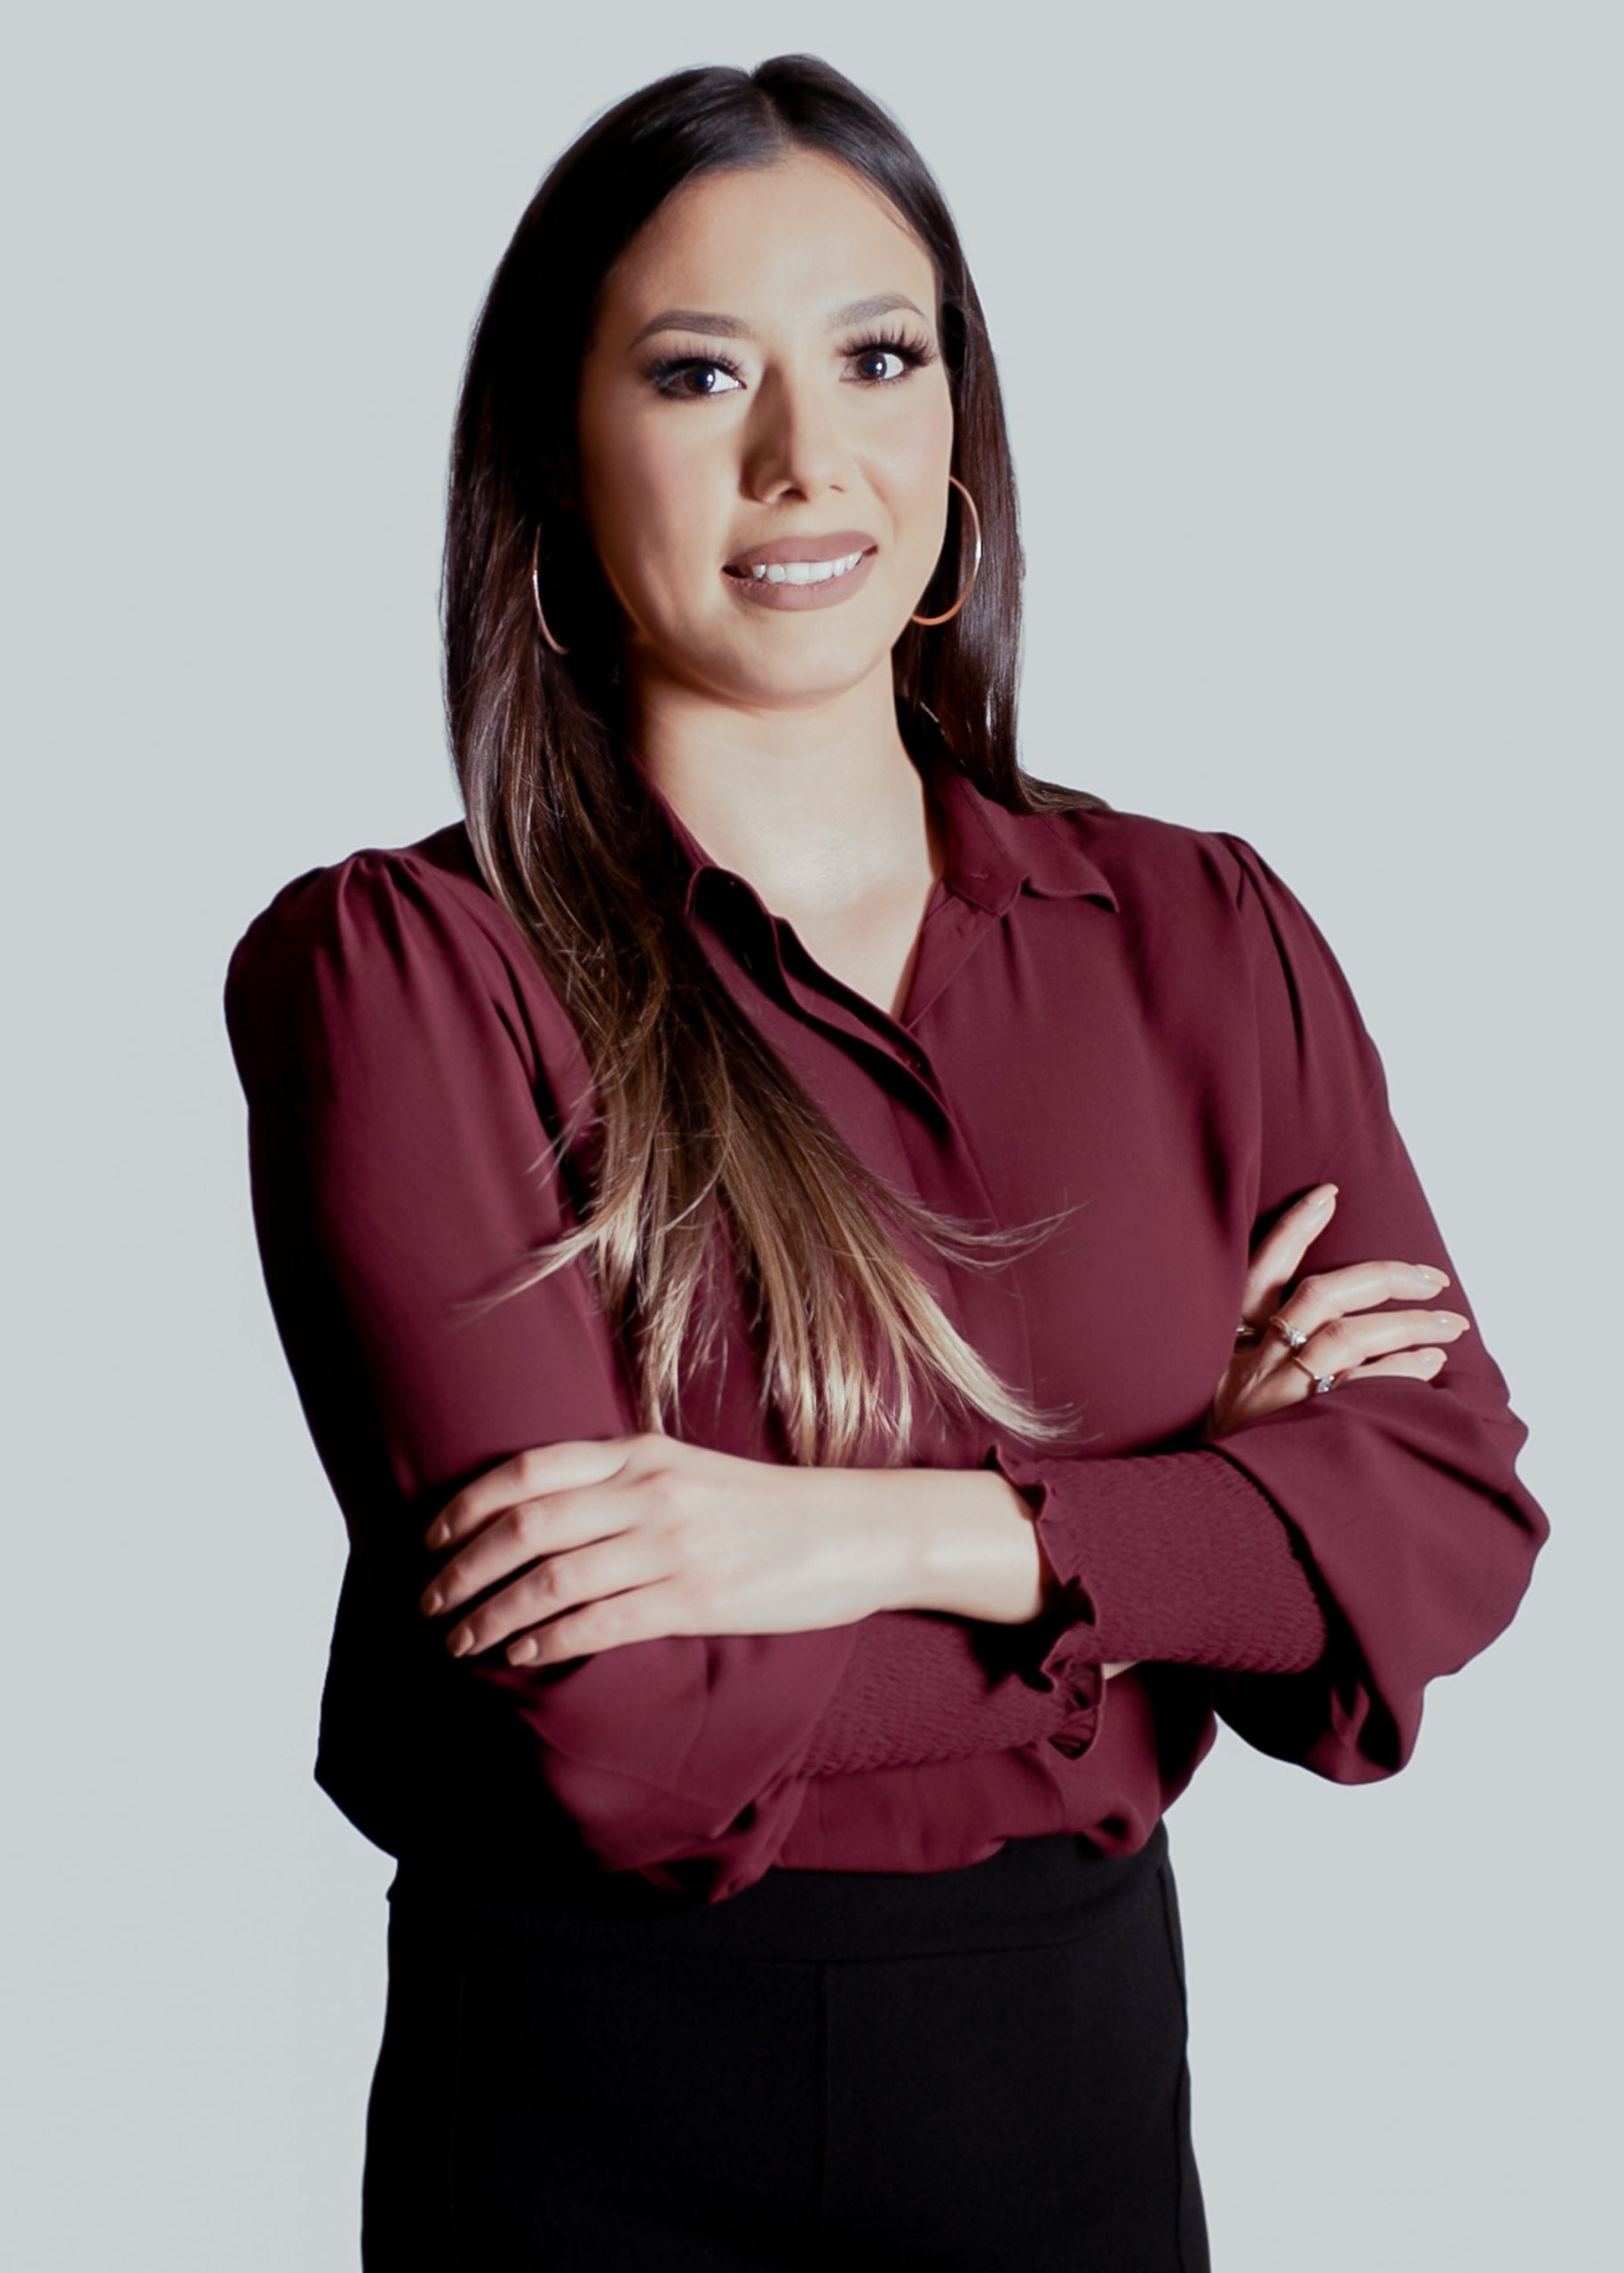 Kristina Argais